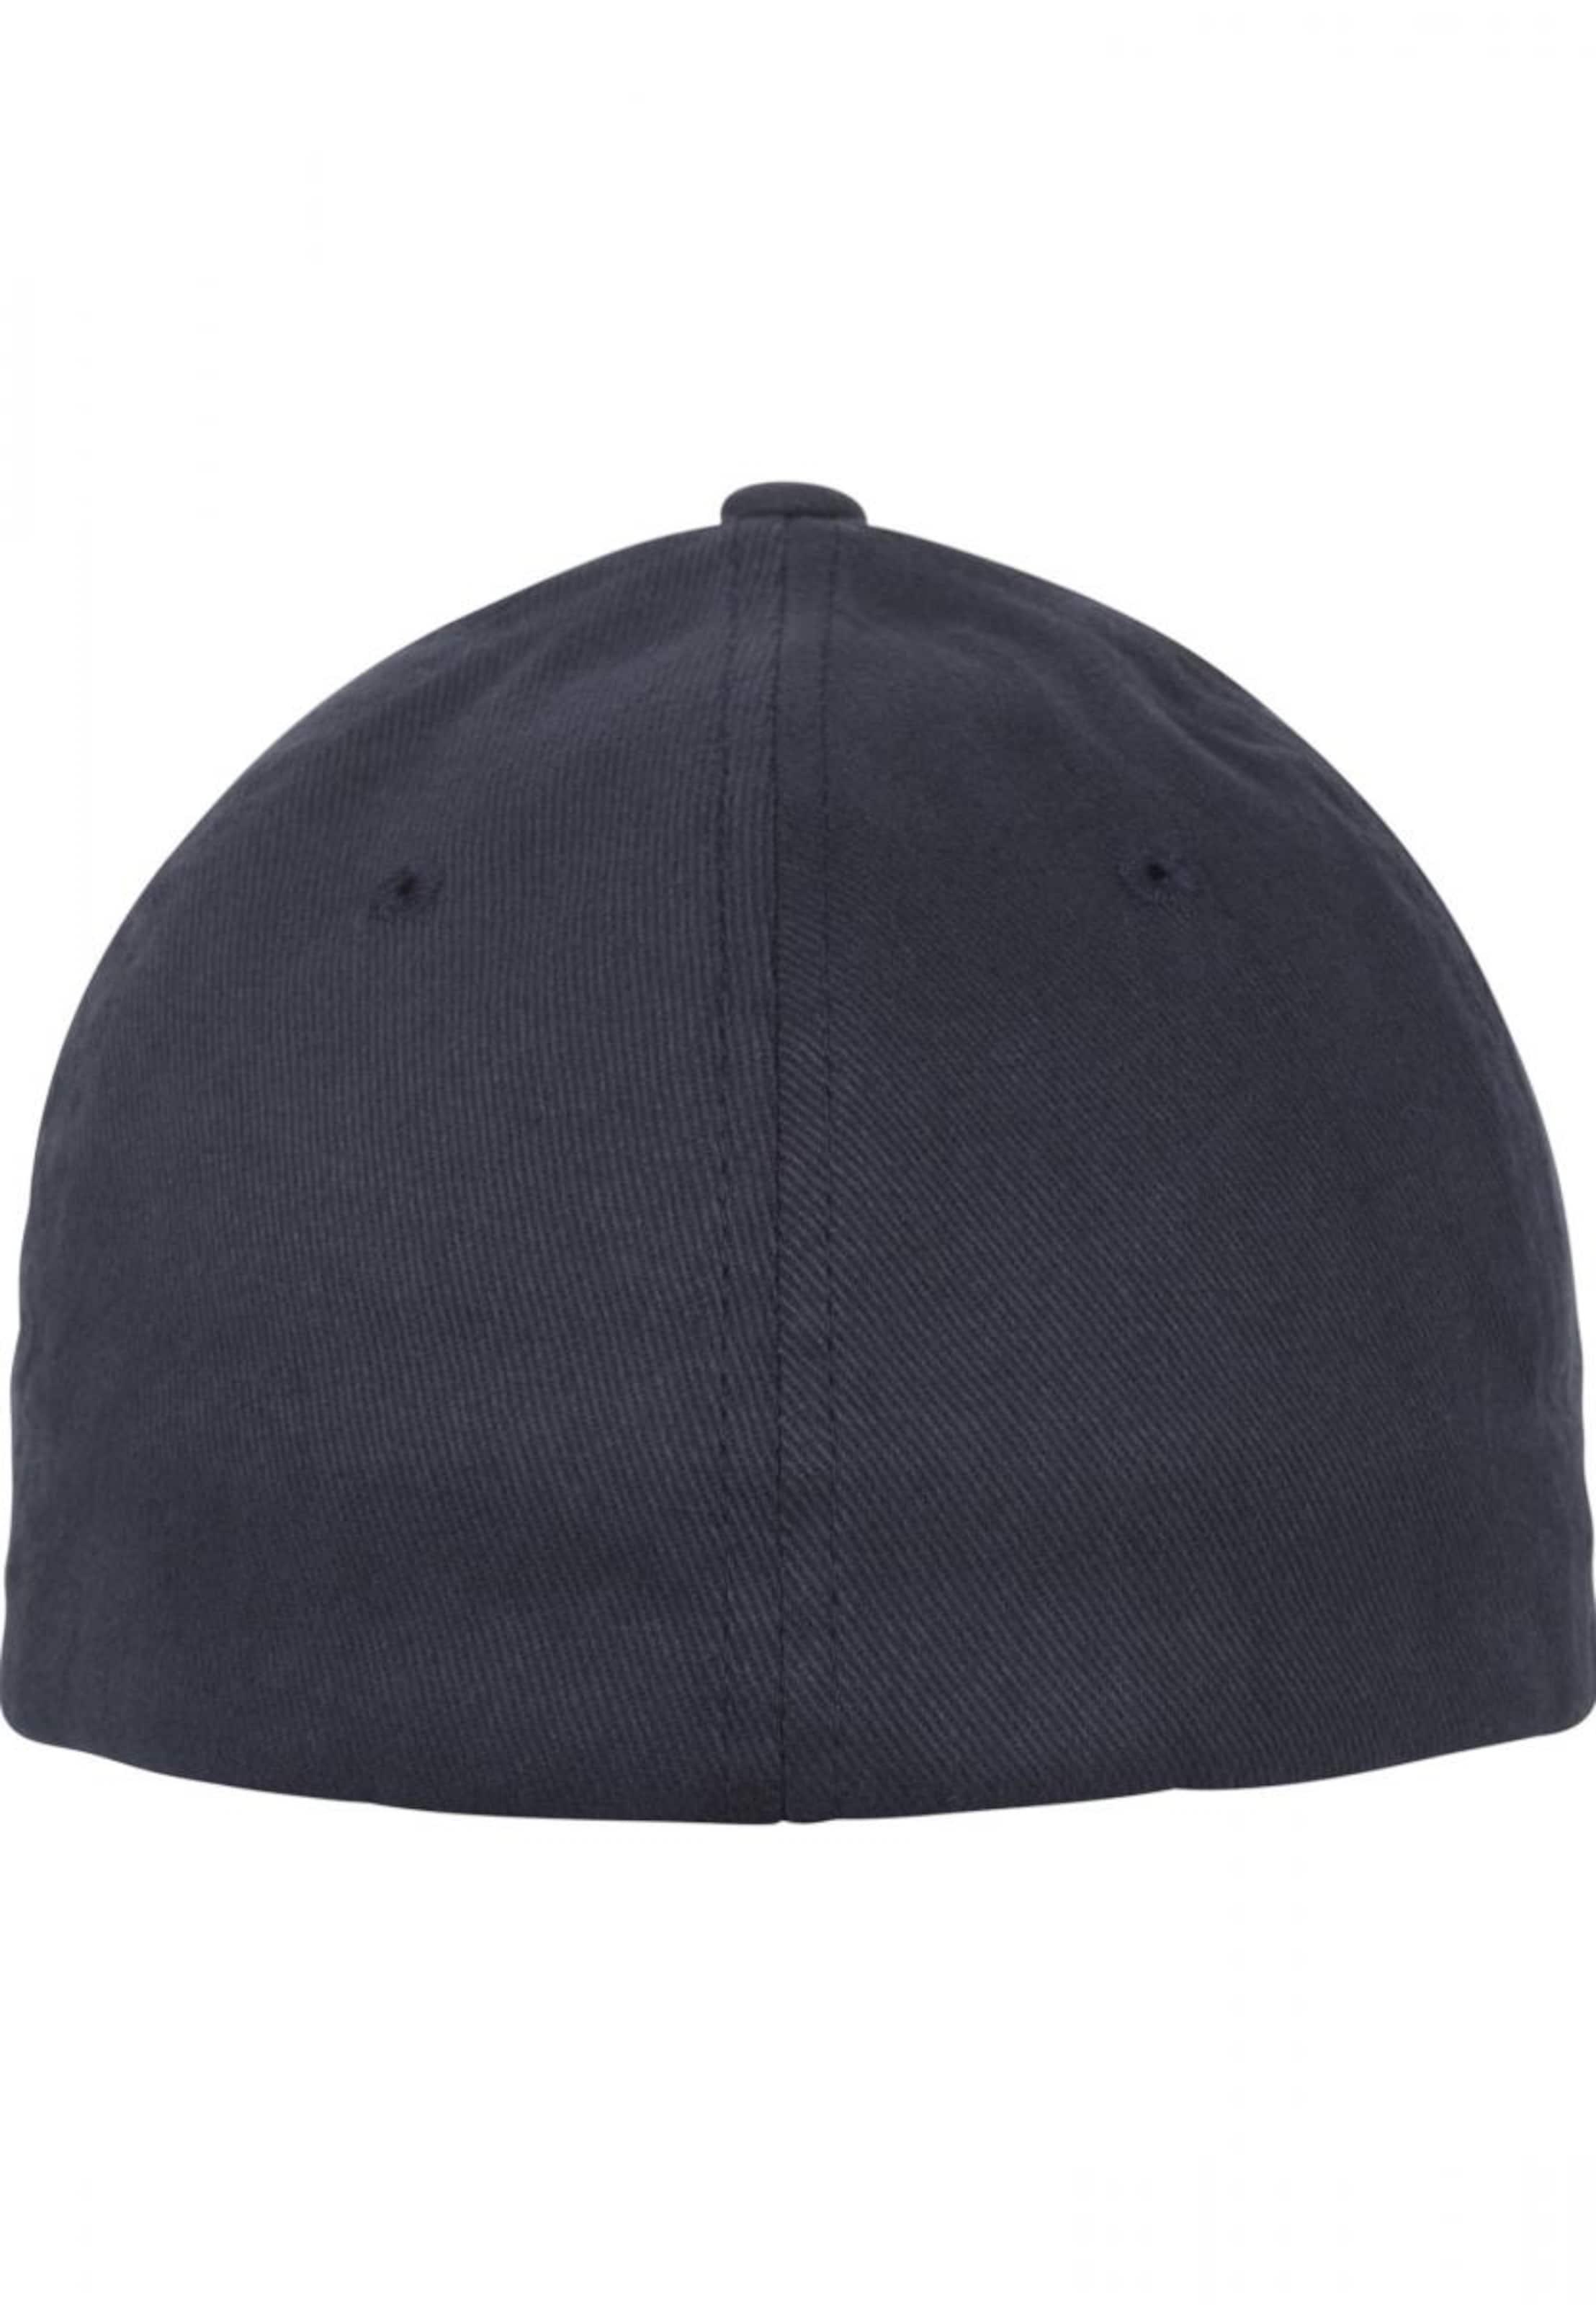 Twill' In 'brushed Cap Flexfit Navy thQCsrdx